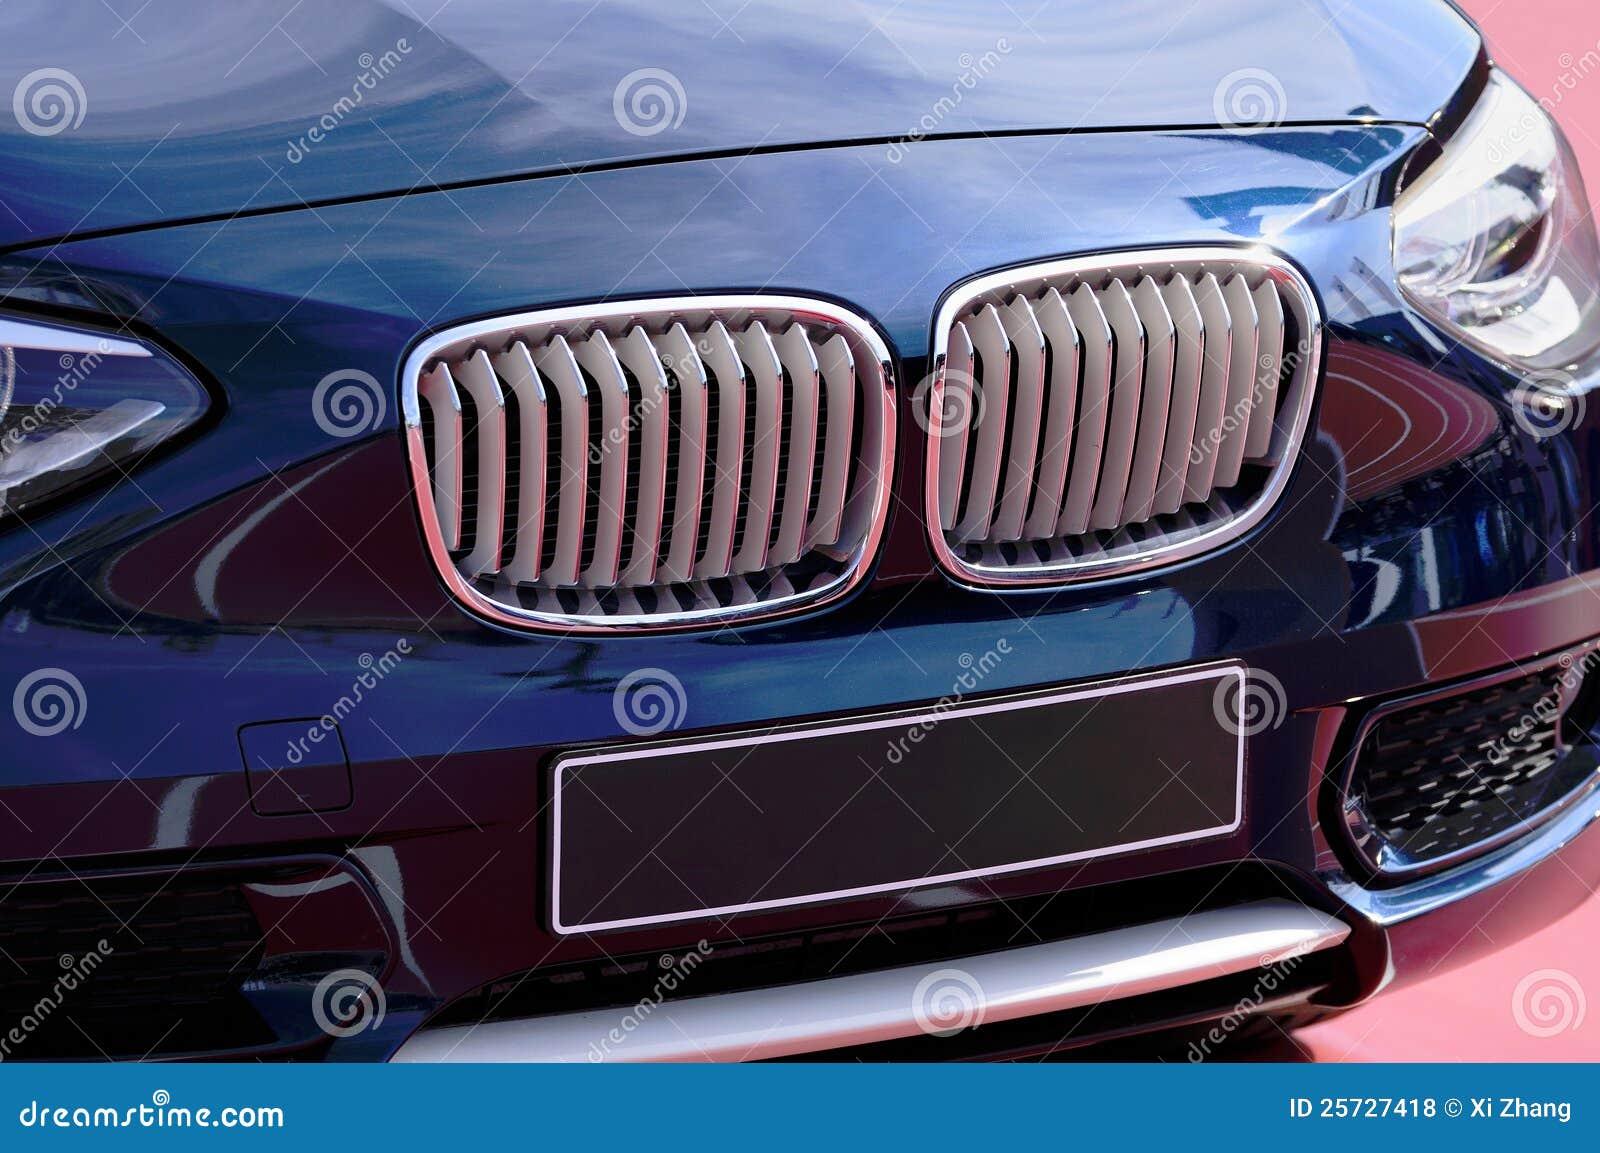 Bmw-bil